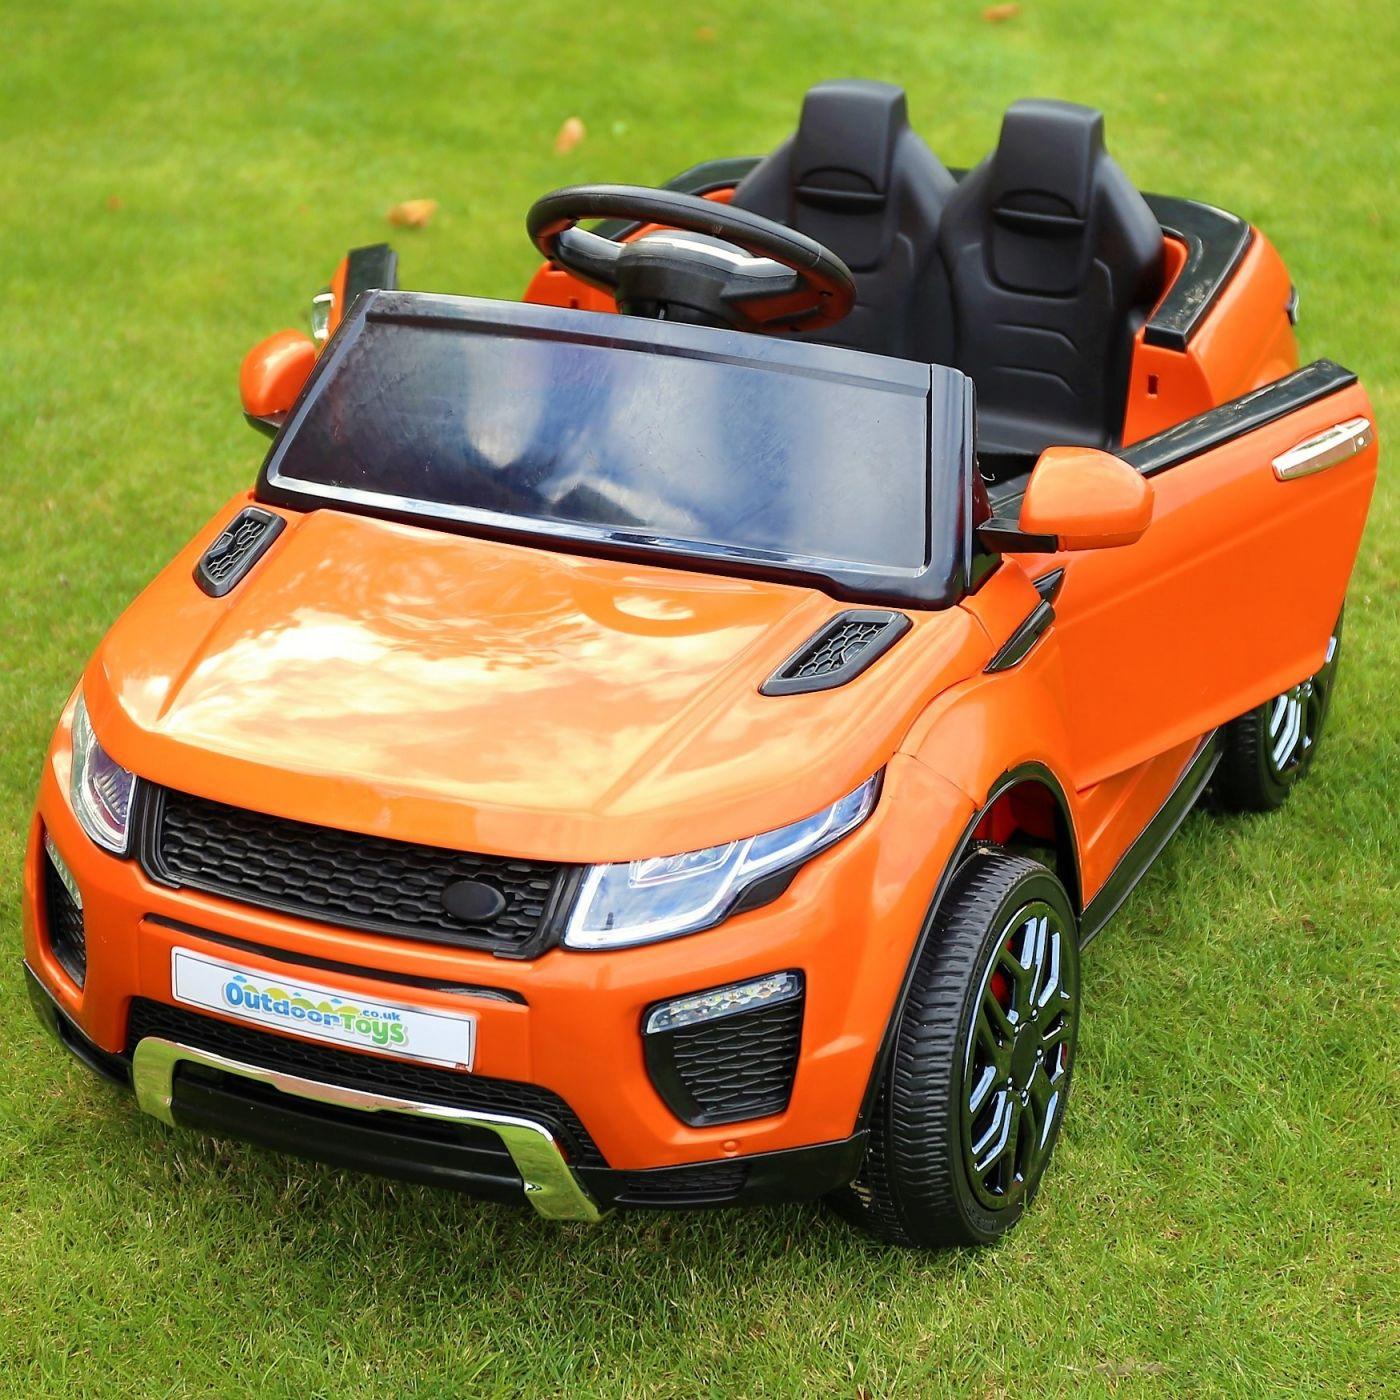 83bb7b7fd15 Range Rover Evoque Style 12v Child s Ride On Car - Orange For Just £164.95